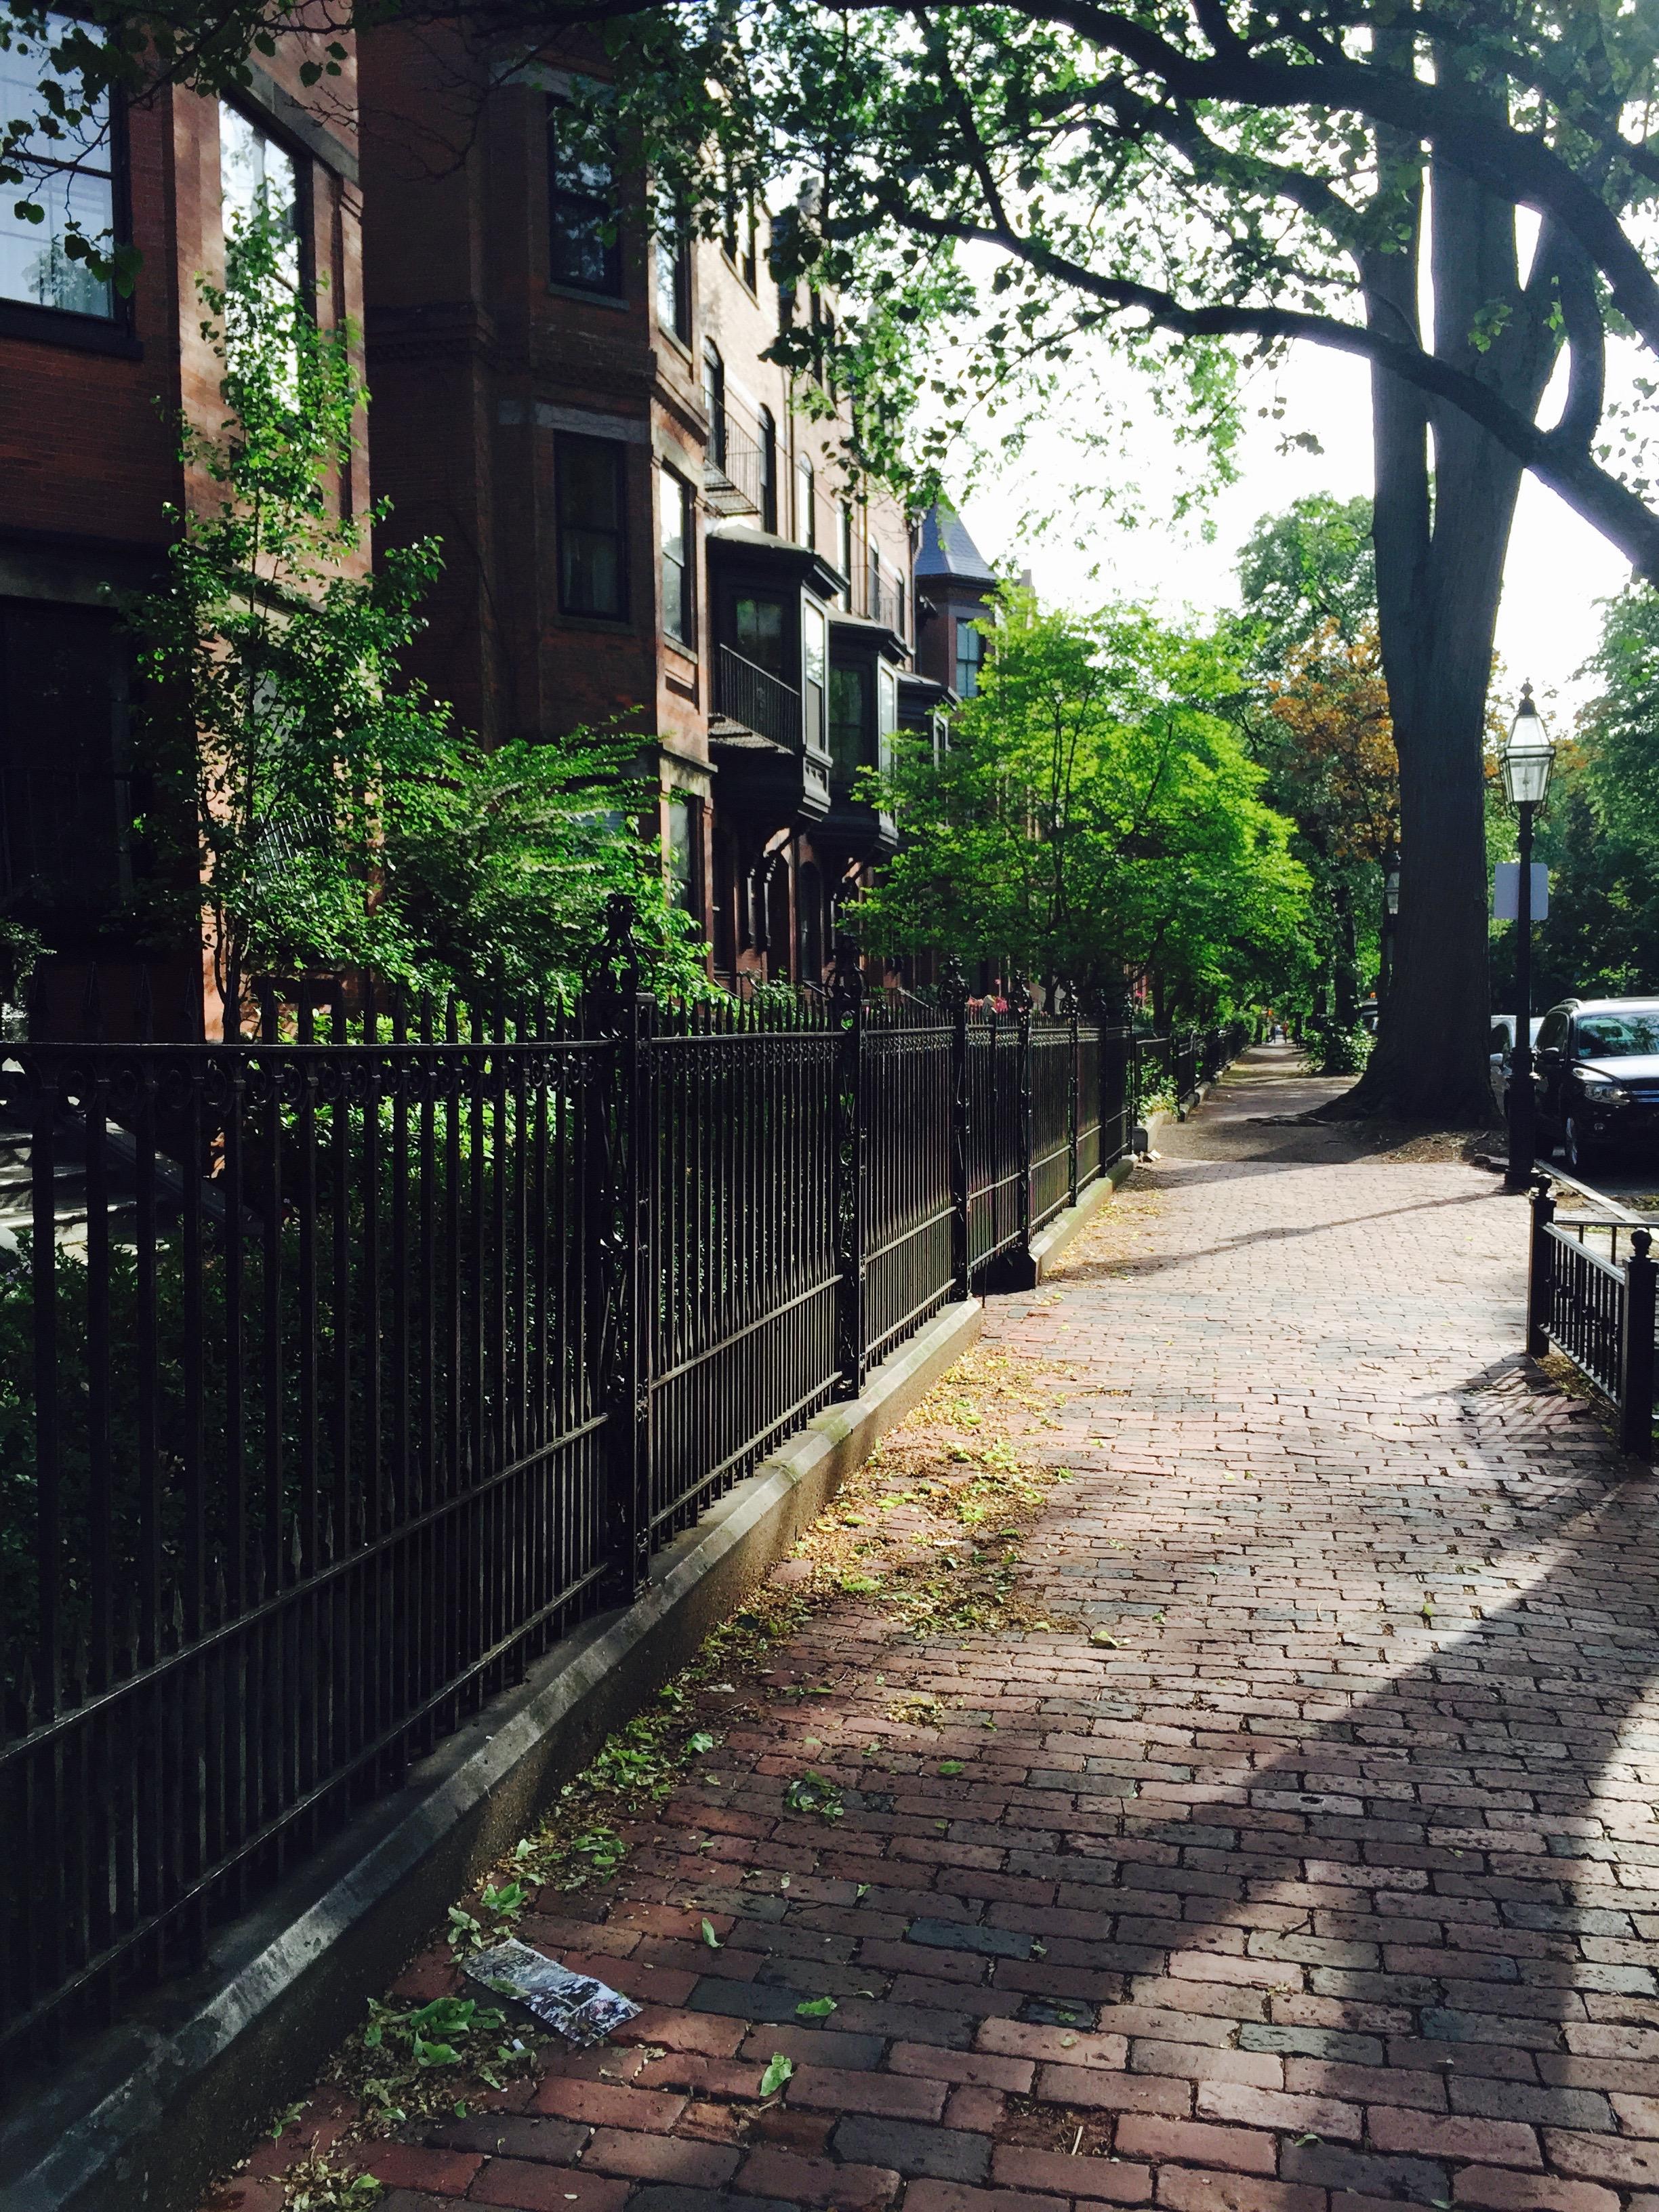 Marlboro Street in the Back Bay of Boston